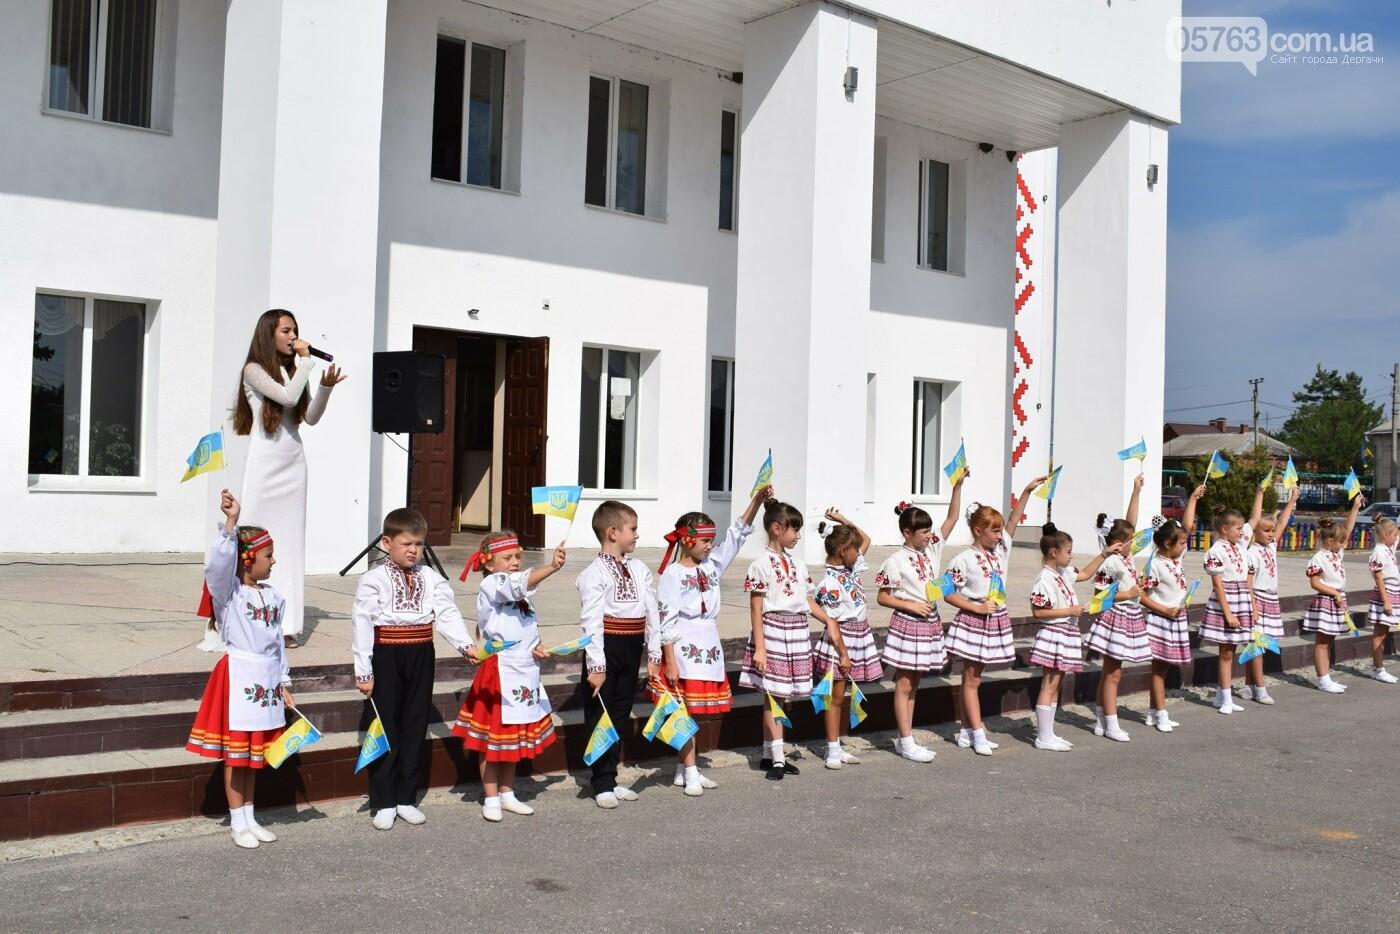 В Дергачах подняли флаг Украины (фото), фото-14